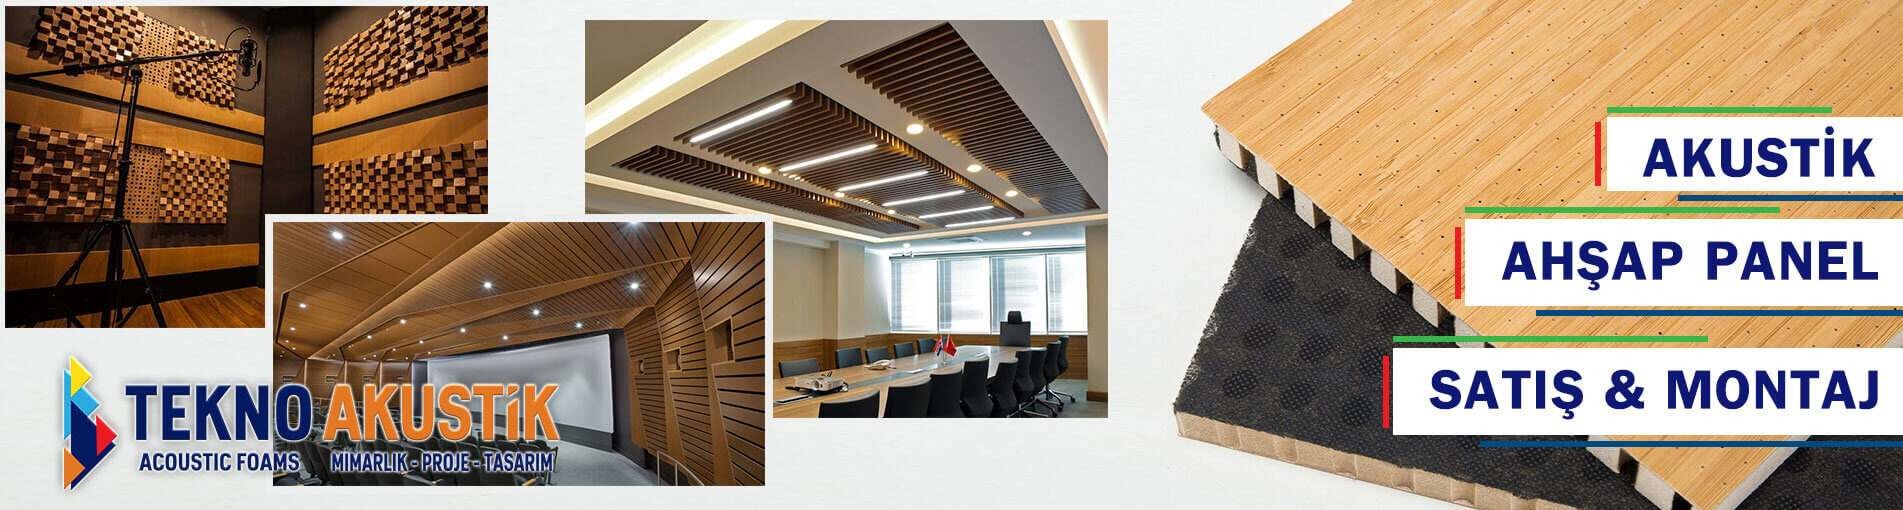 akustik ahşap panel firması